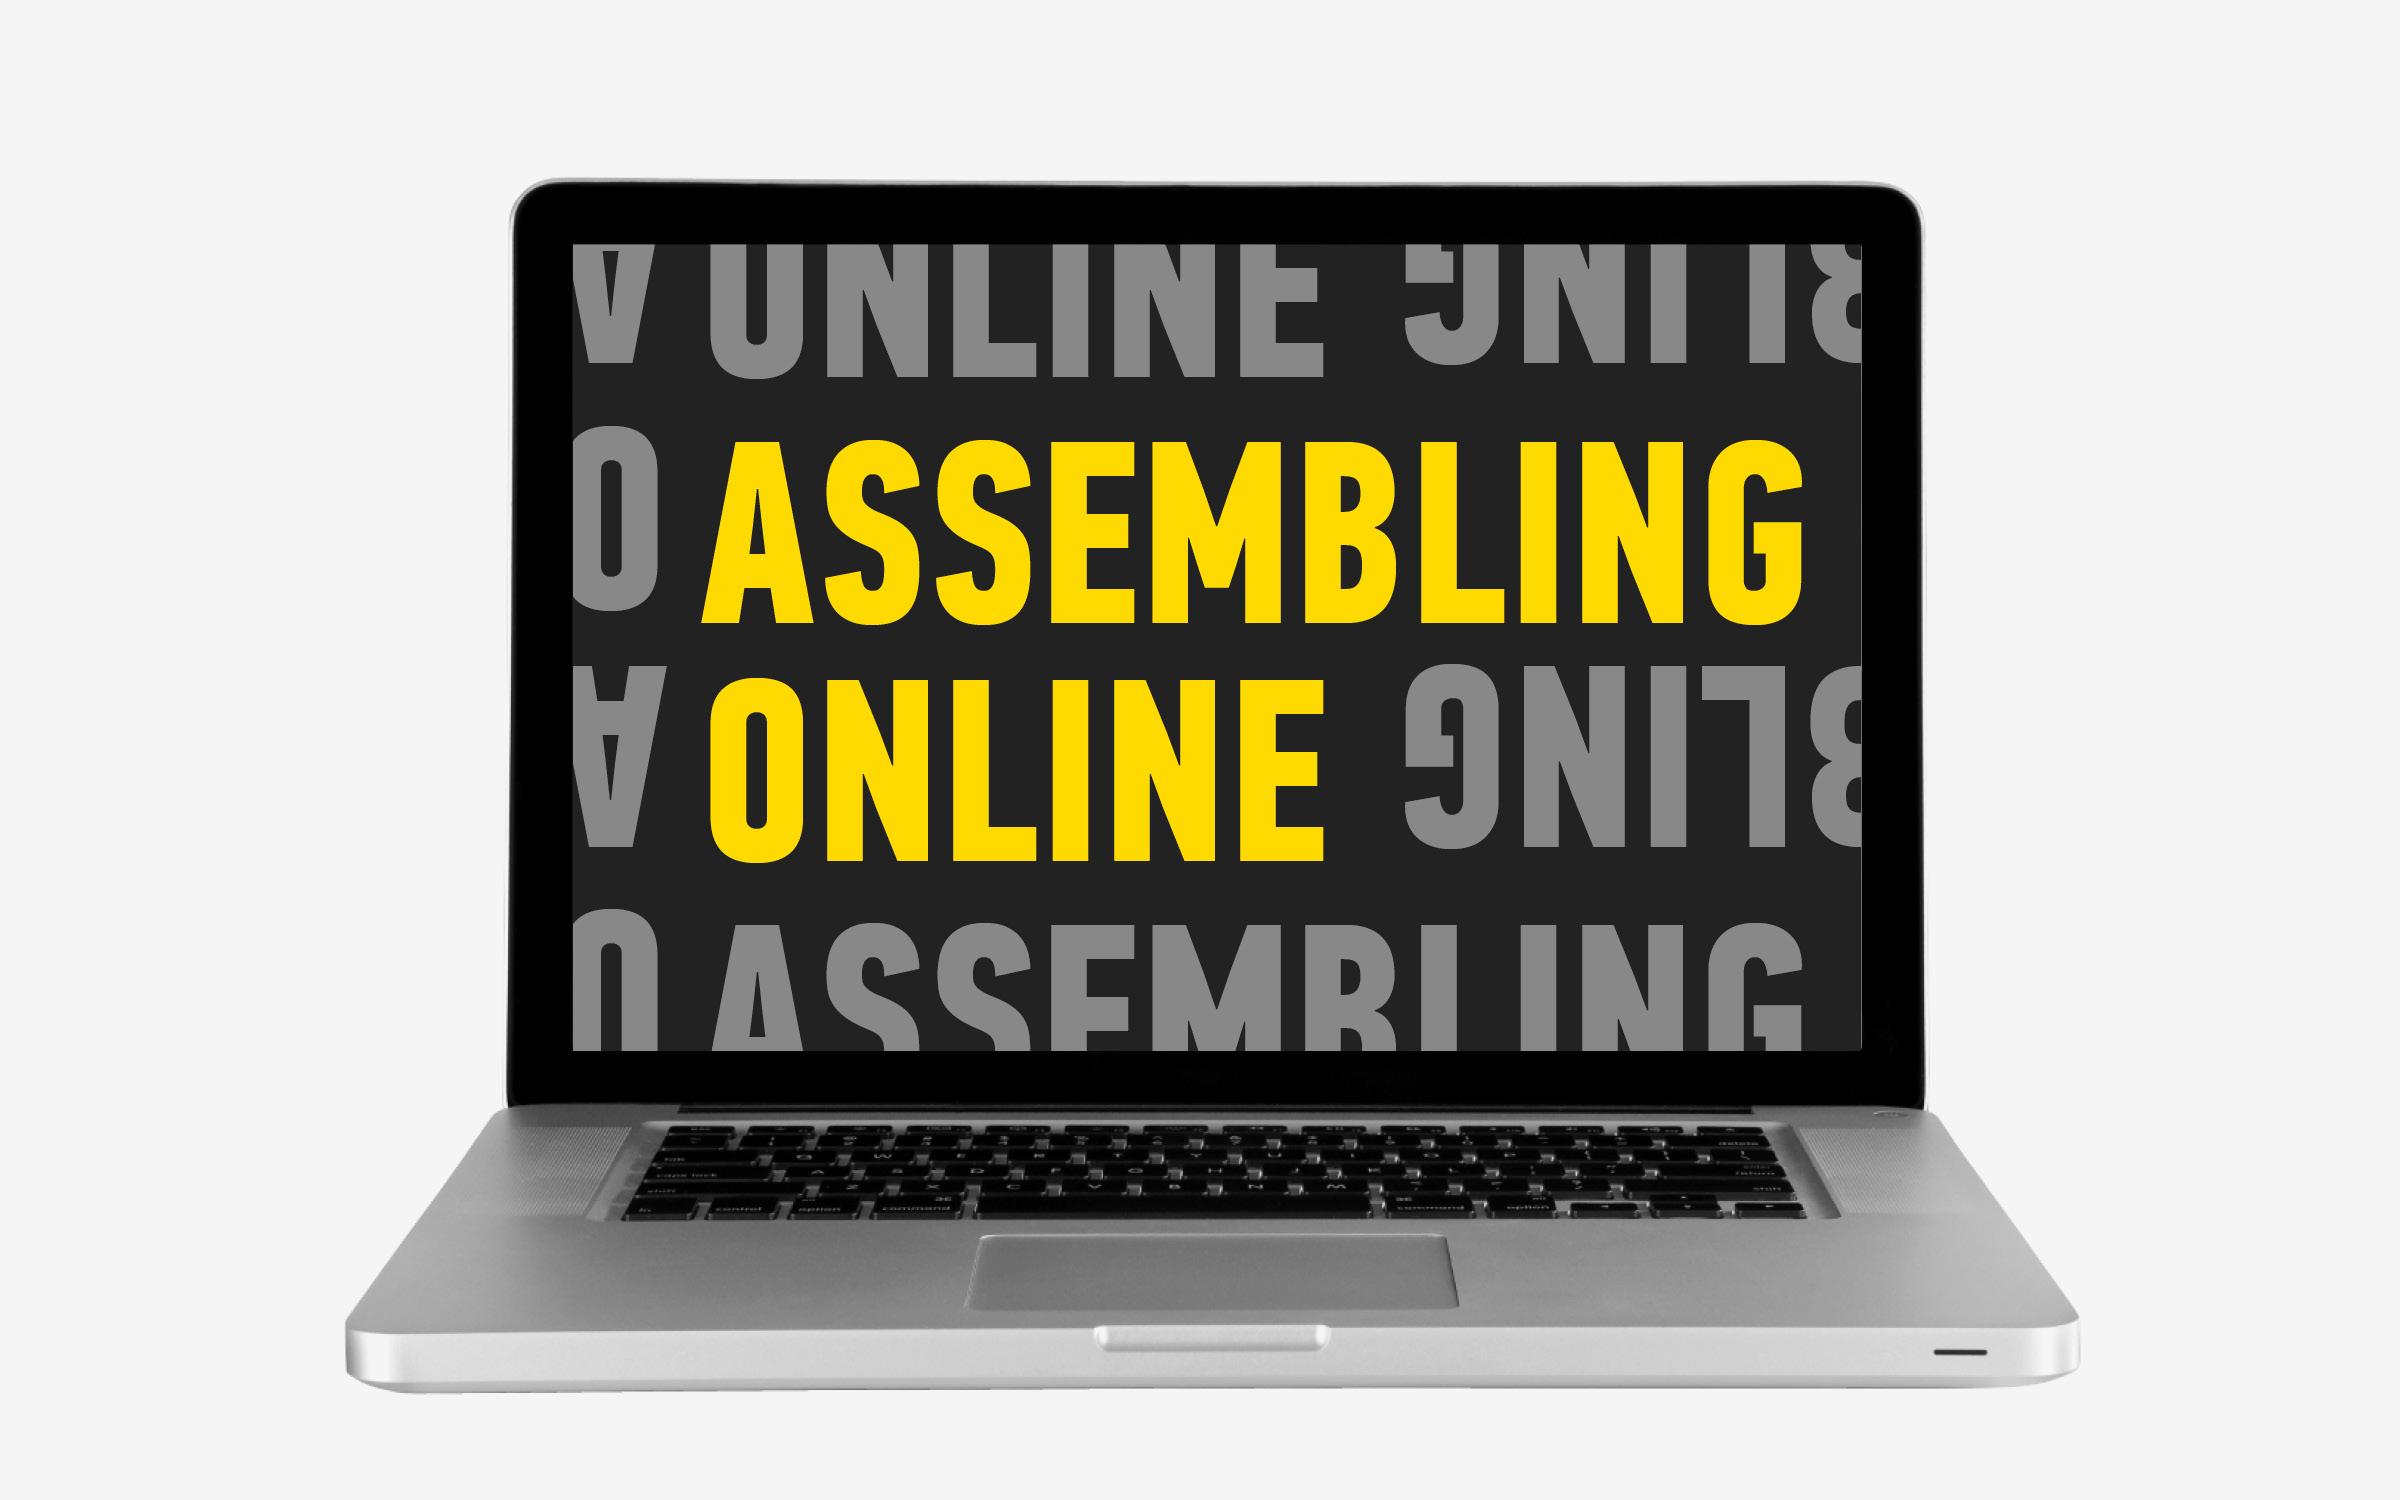 [Assembling Online] Inside the Minds of Brilliant Designers